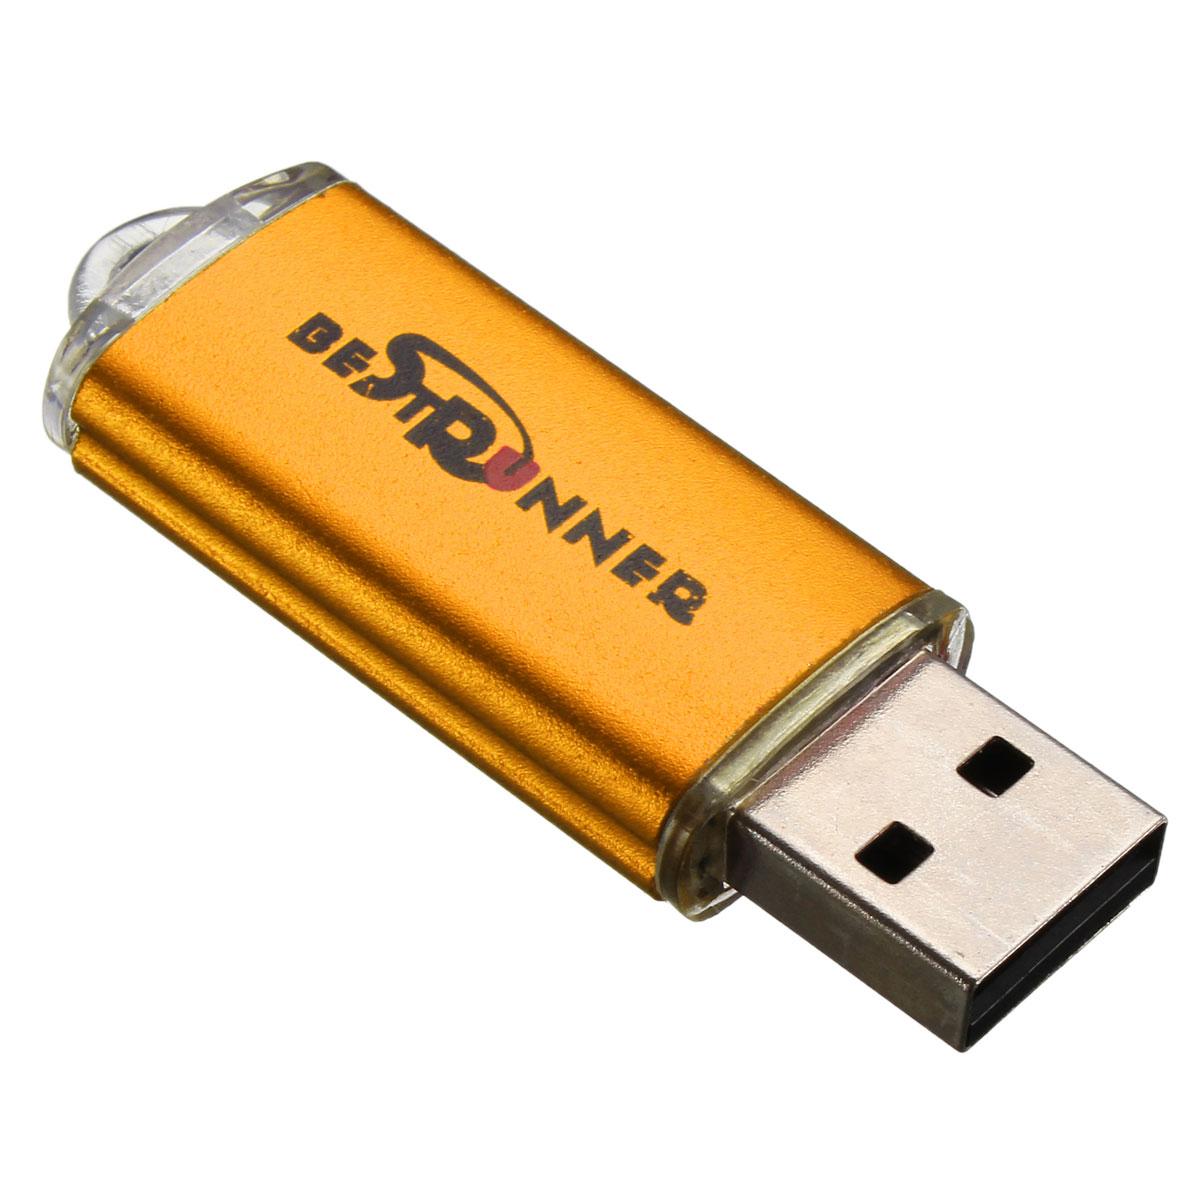 BESTRUNNER 256MB USB 2.0 Flash Memory Stick Pen Drive Storage Thumb Candy Color